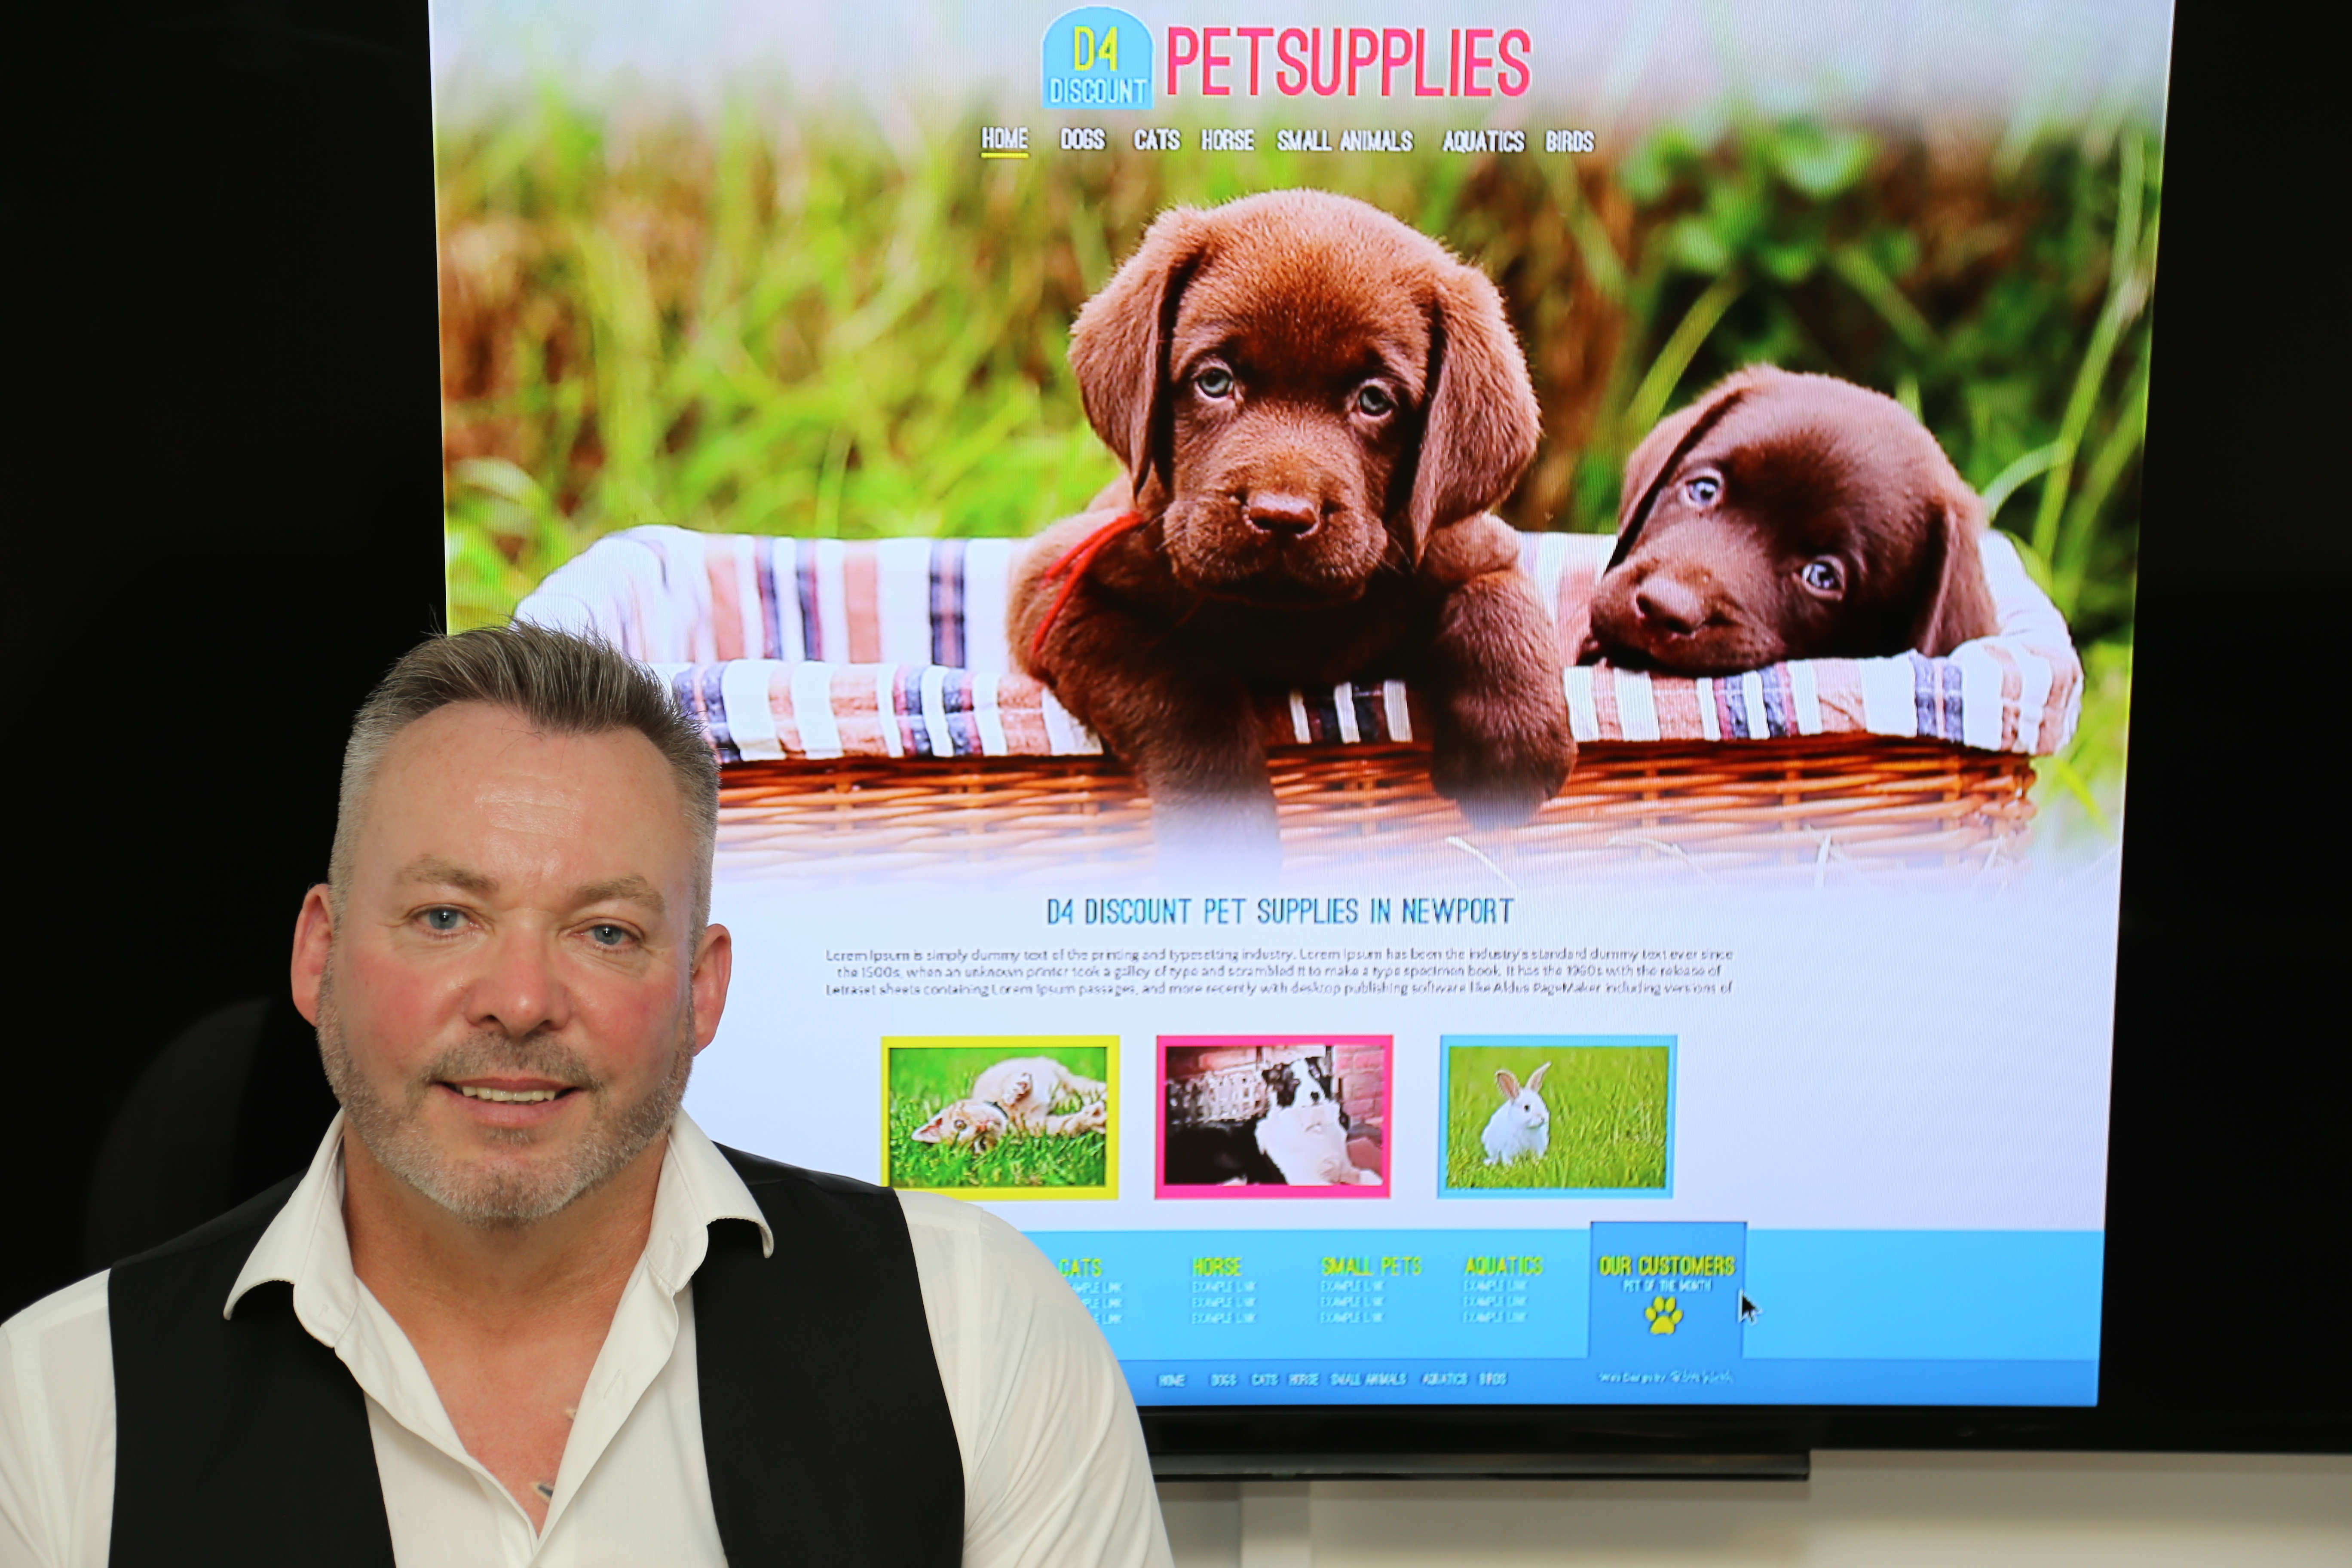 Pet Supplies Business Opens In Newport - Compass Media